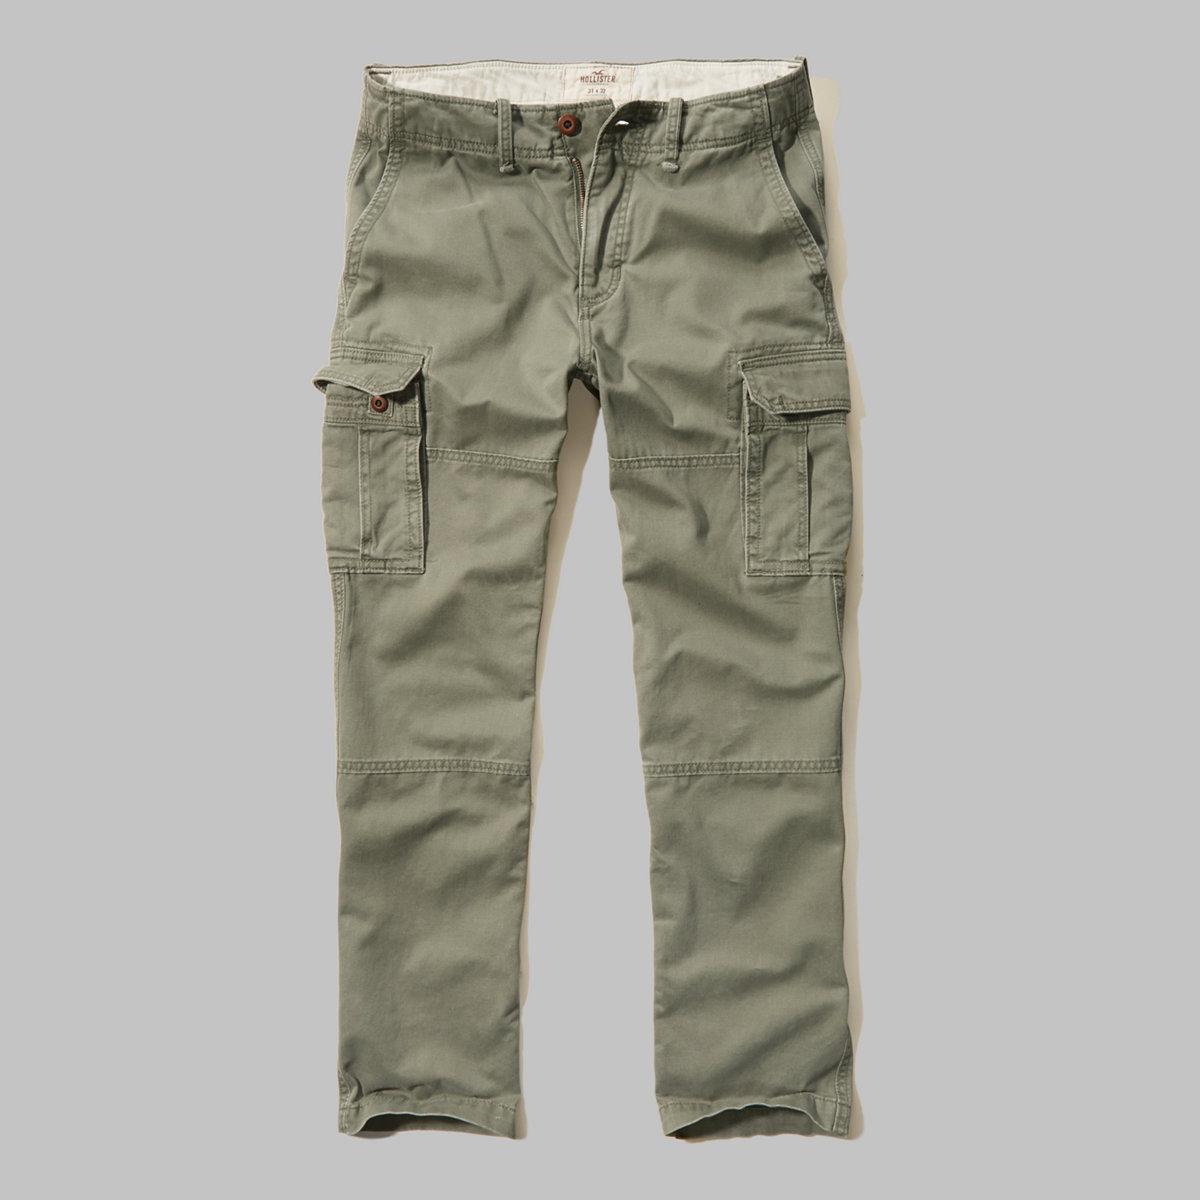 Hollister Slim Cargo Zipper Fly Pants